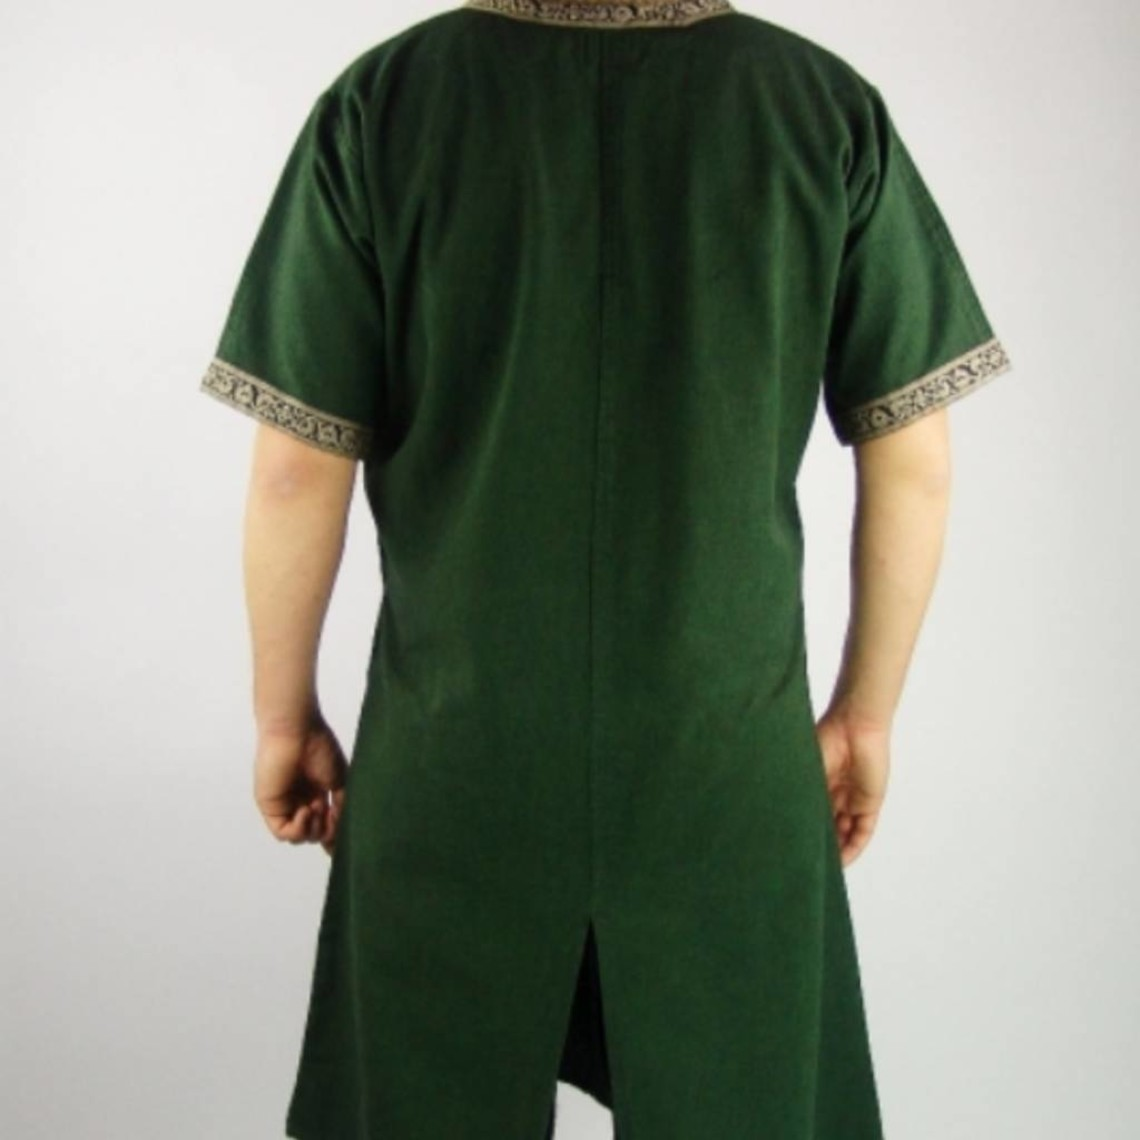 Leonardo Carbone Keltische tuniek, korte mouwen, crème